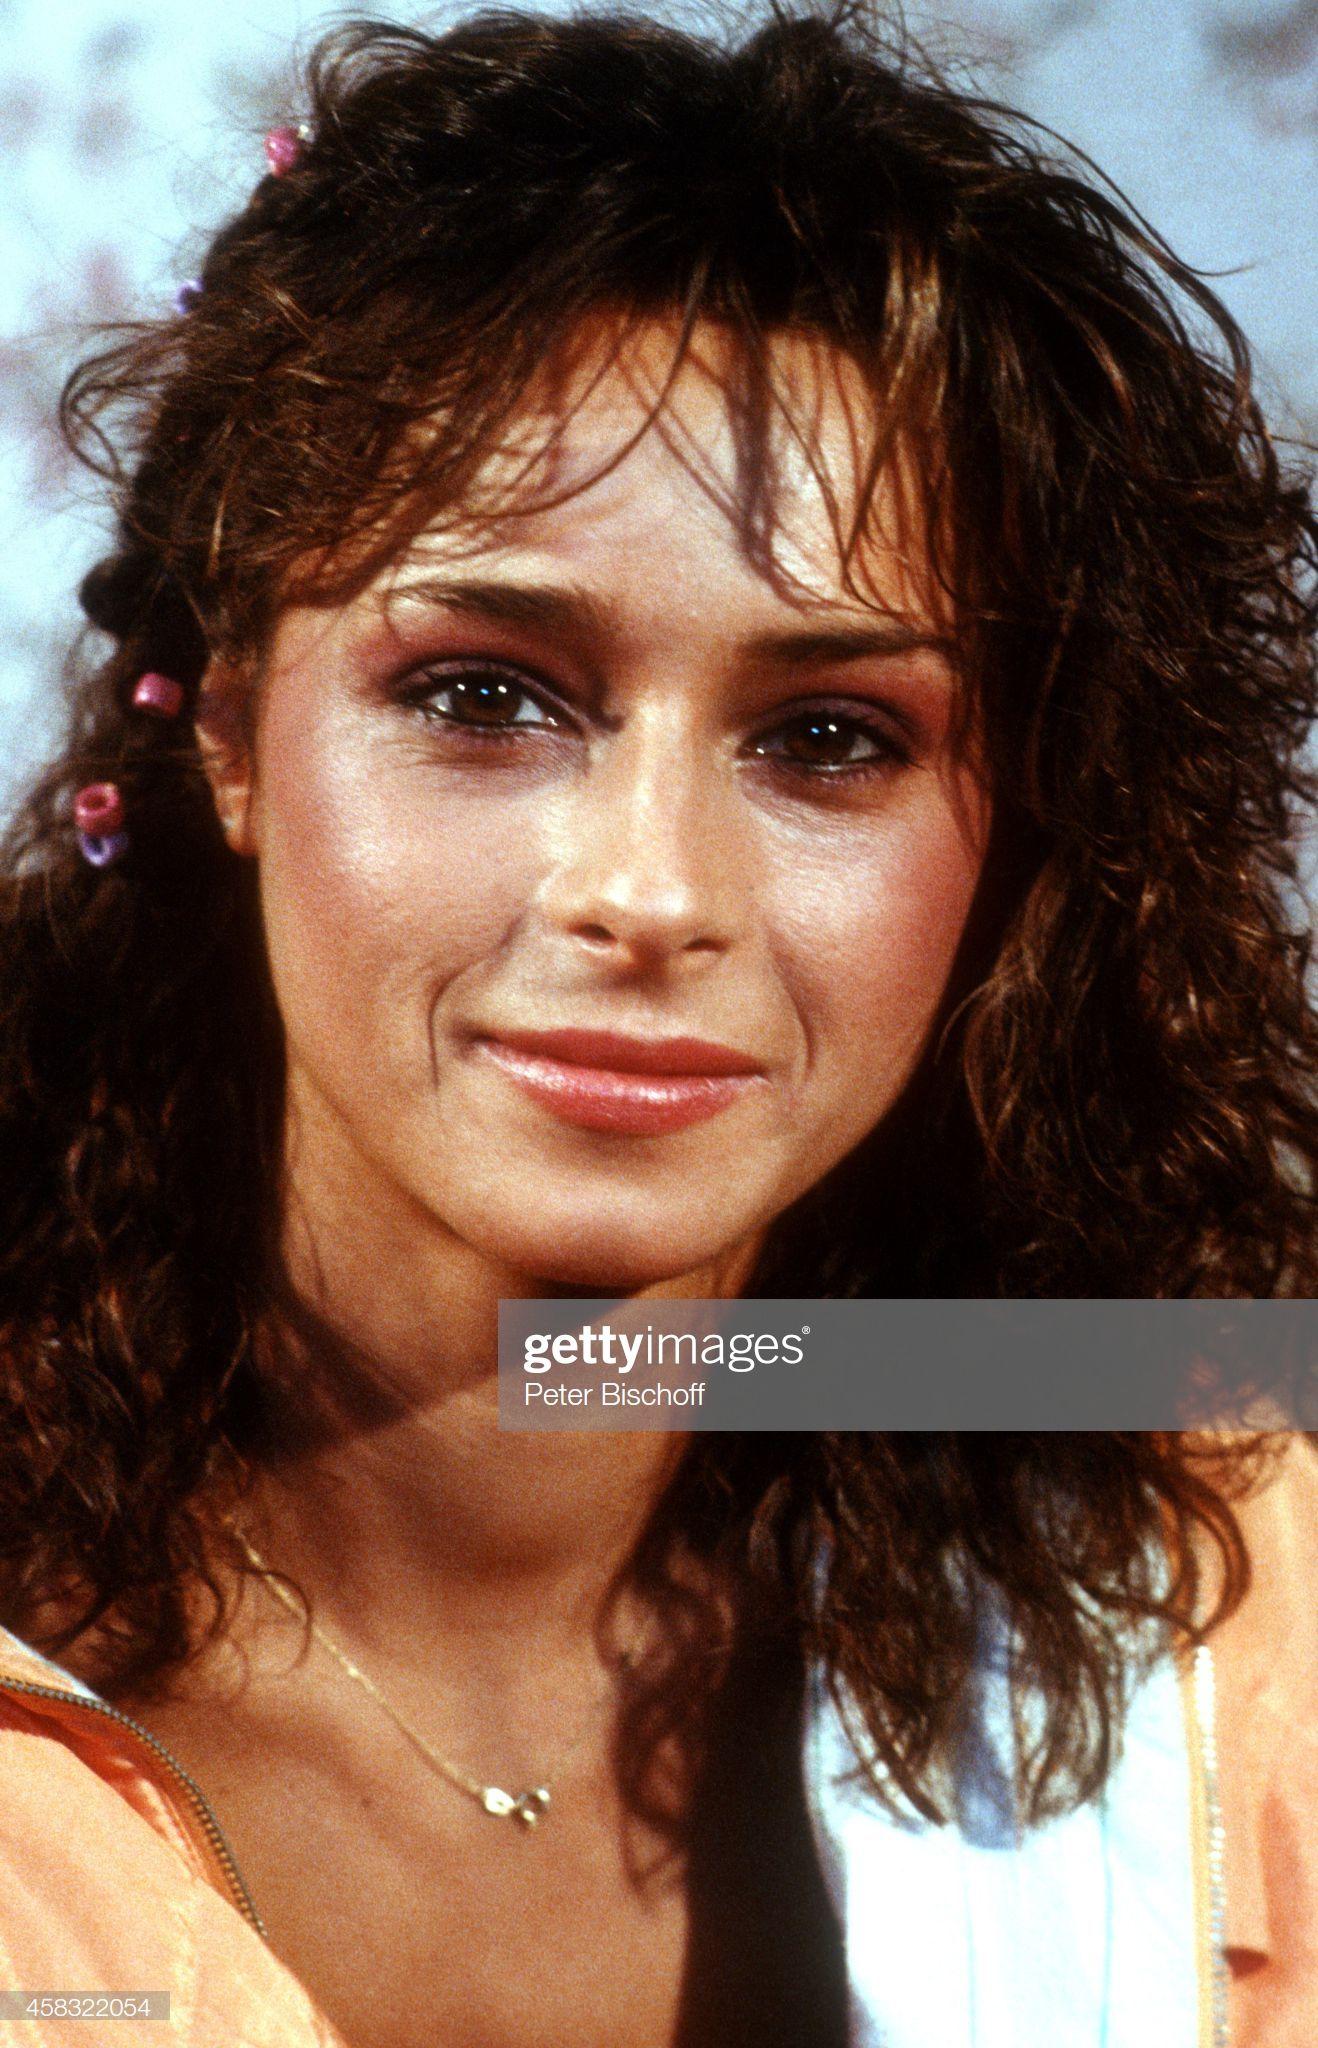 Christina Plate 1986 in Deutschland. in 2020 | Christina